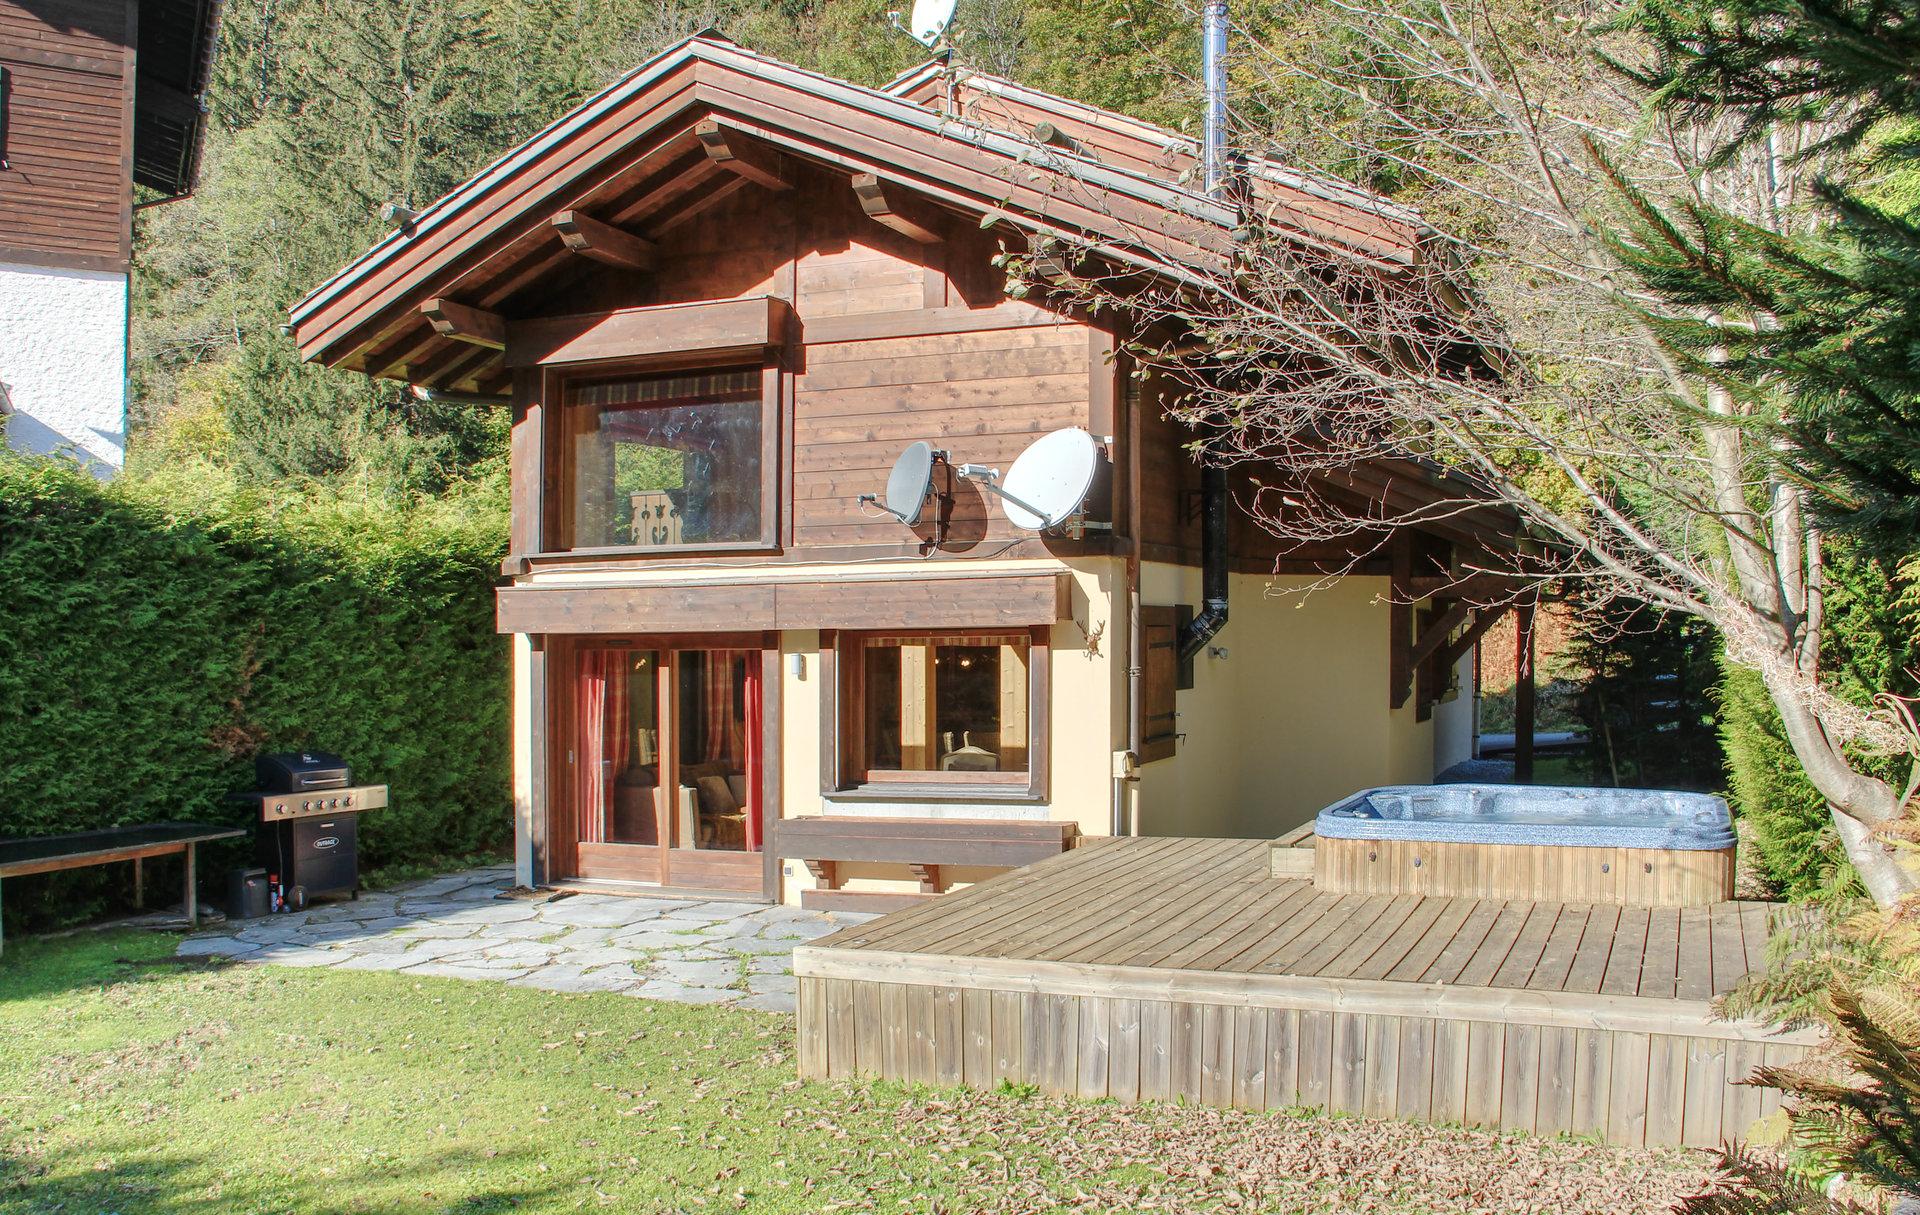 Продажа Шале - Шамони́-Монбла́н (Chamonix-Mont-Blanc) Centre Ville